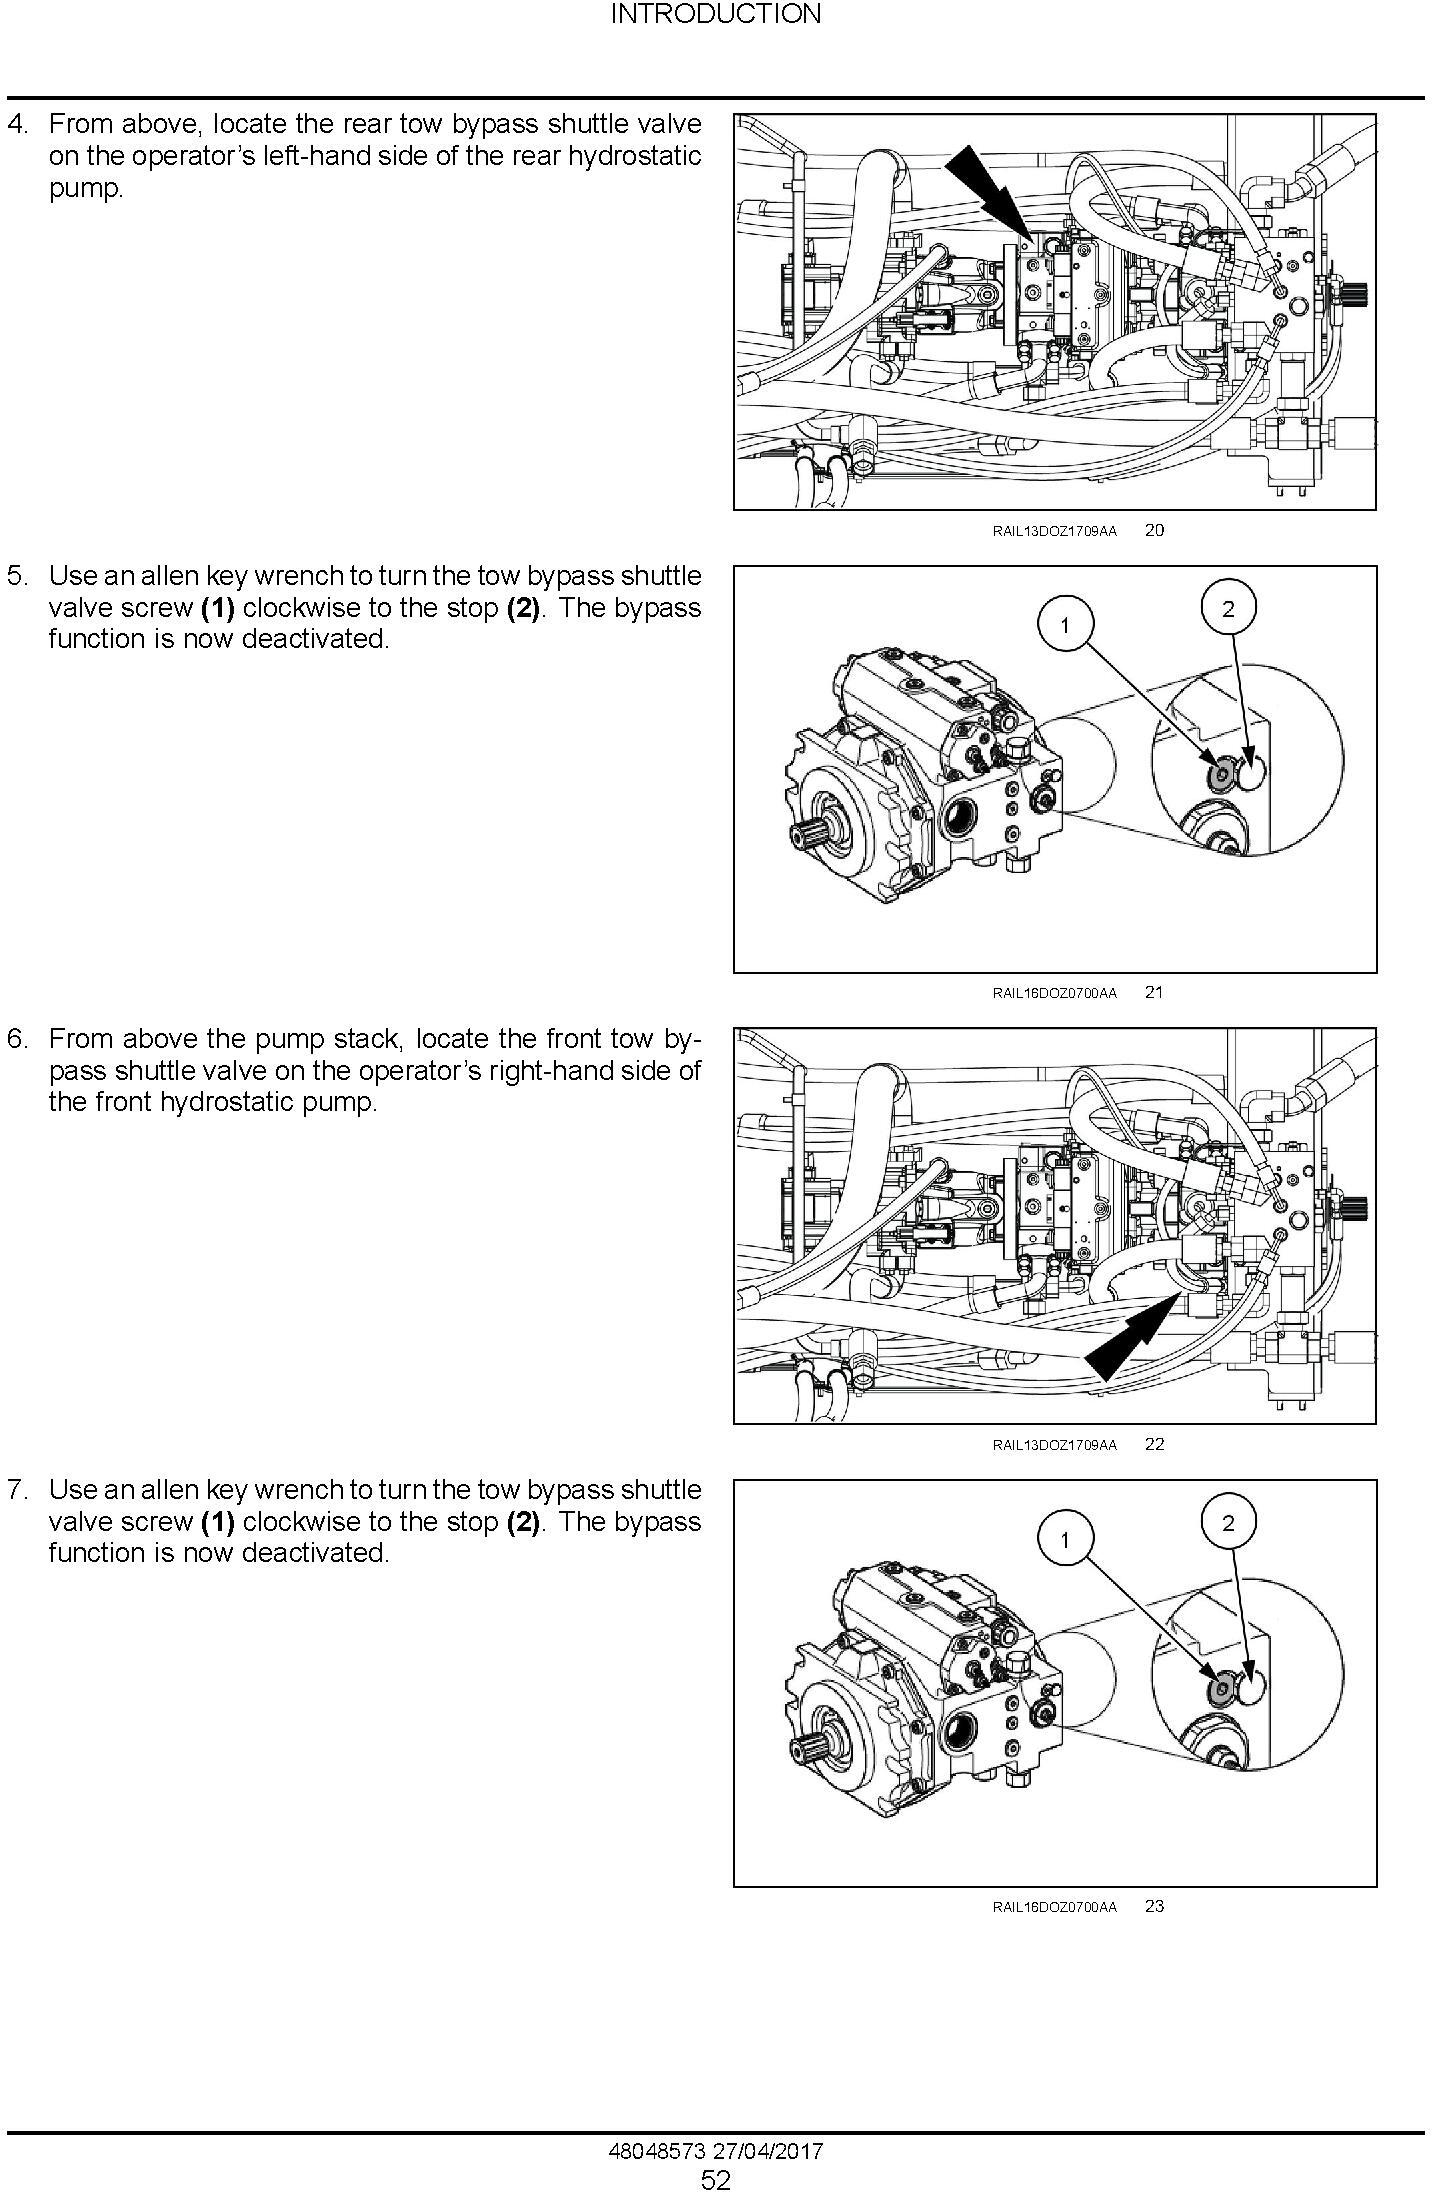 New Holland D180C Tier 2 Crawler Dozer Service Manual - 1